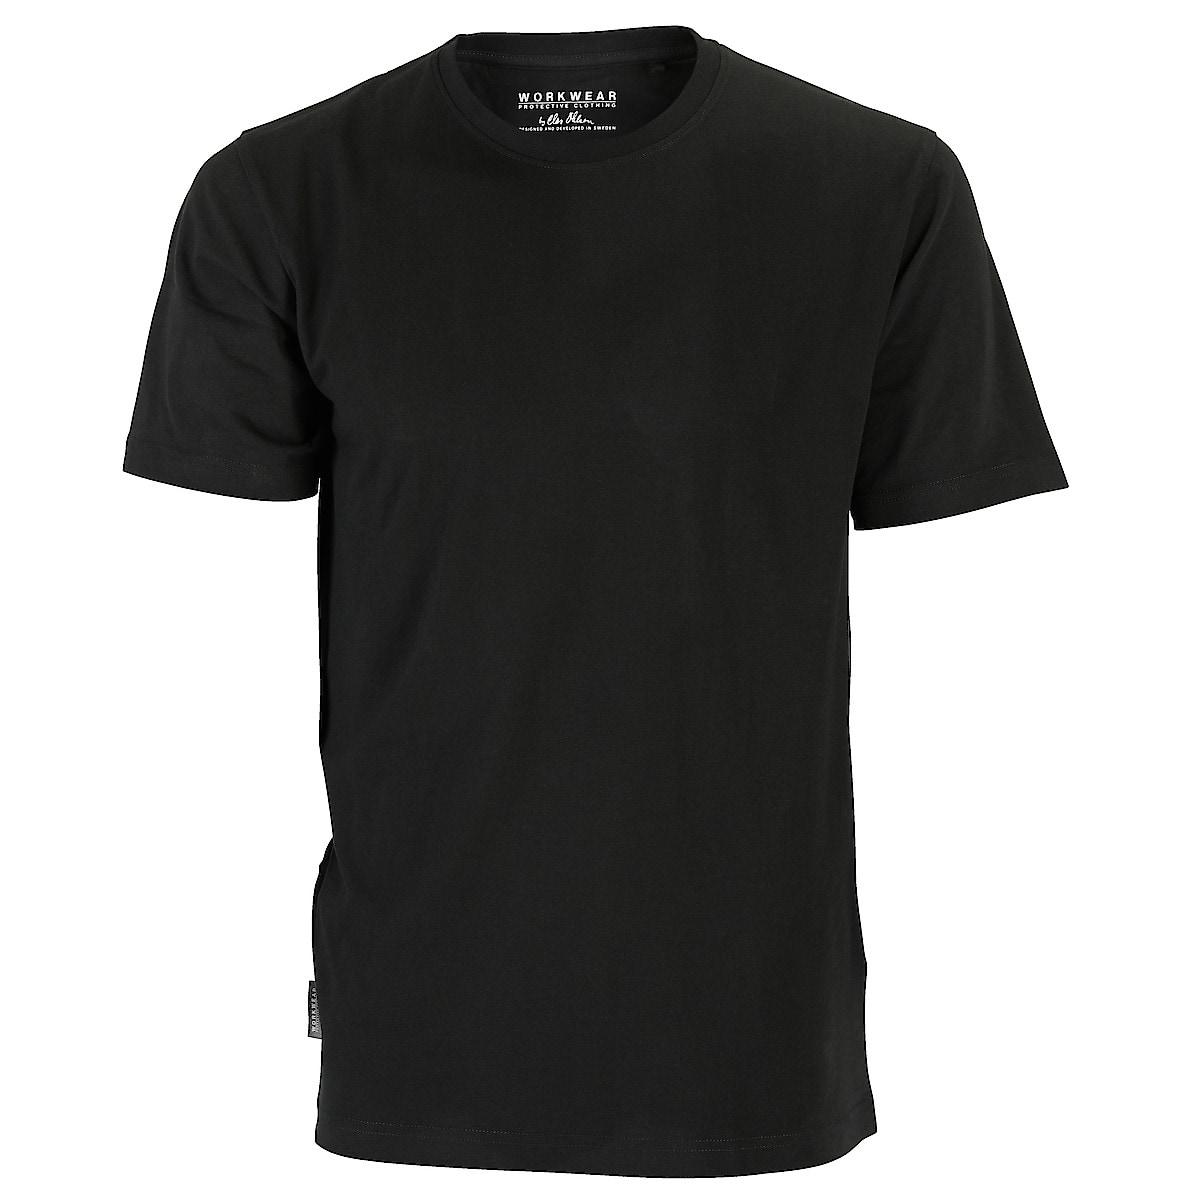 T-shirt herr svart